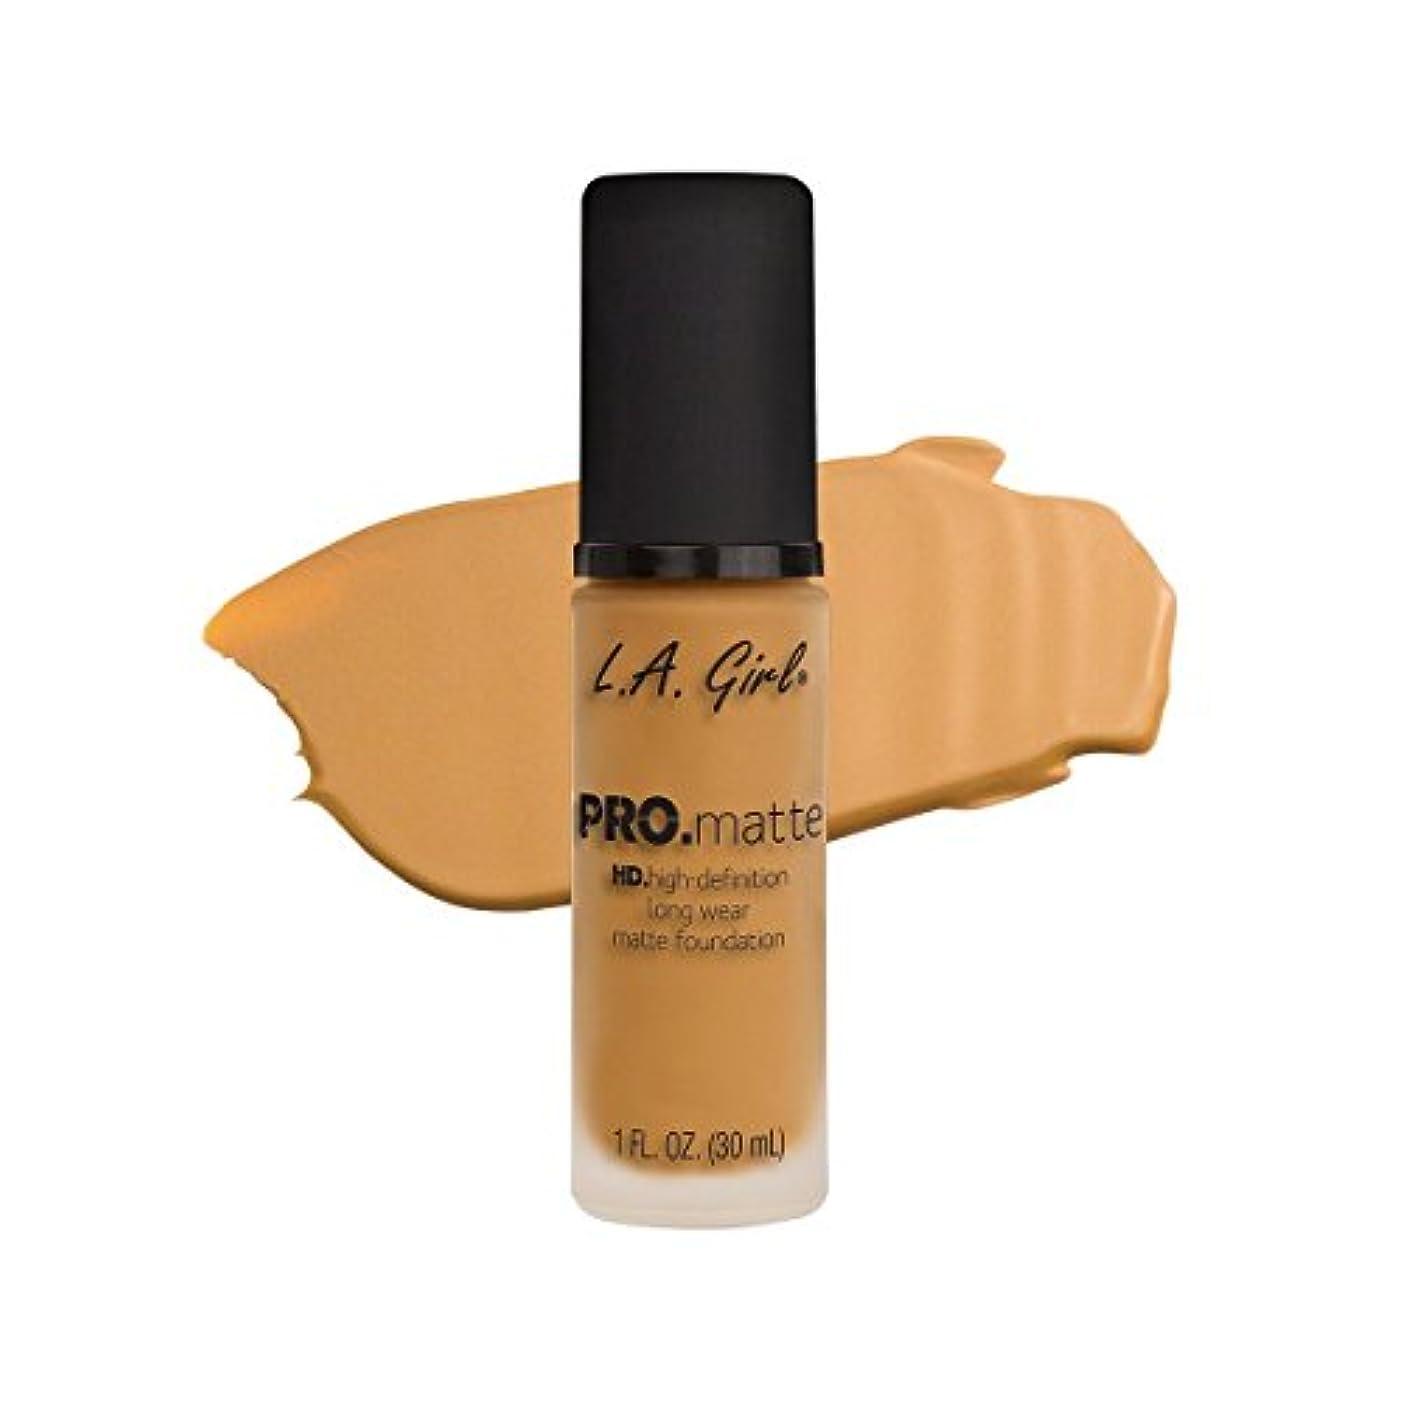 発表故障中統治可能(6 Pack) L.A. GIRL Pro Matte Foundation - Soft Honey (並行輸入品)